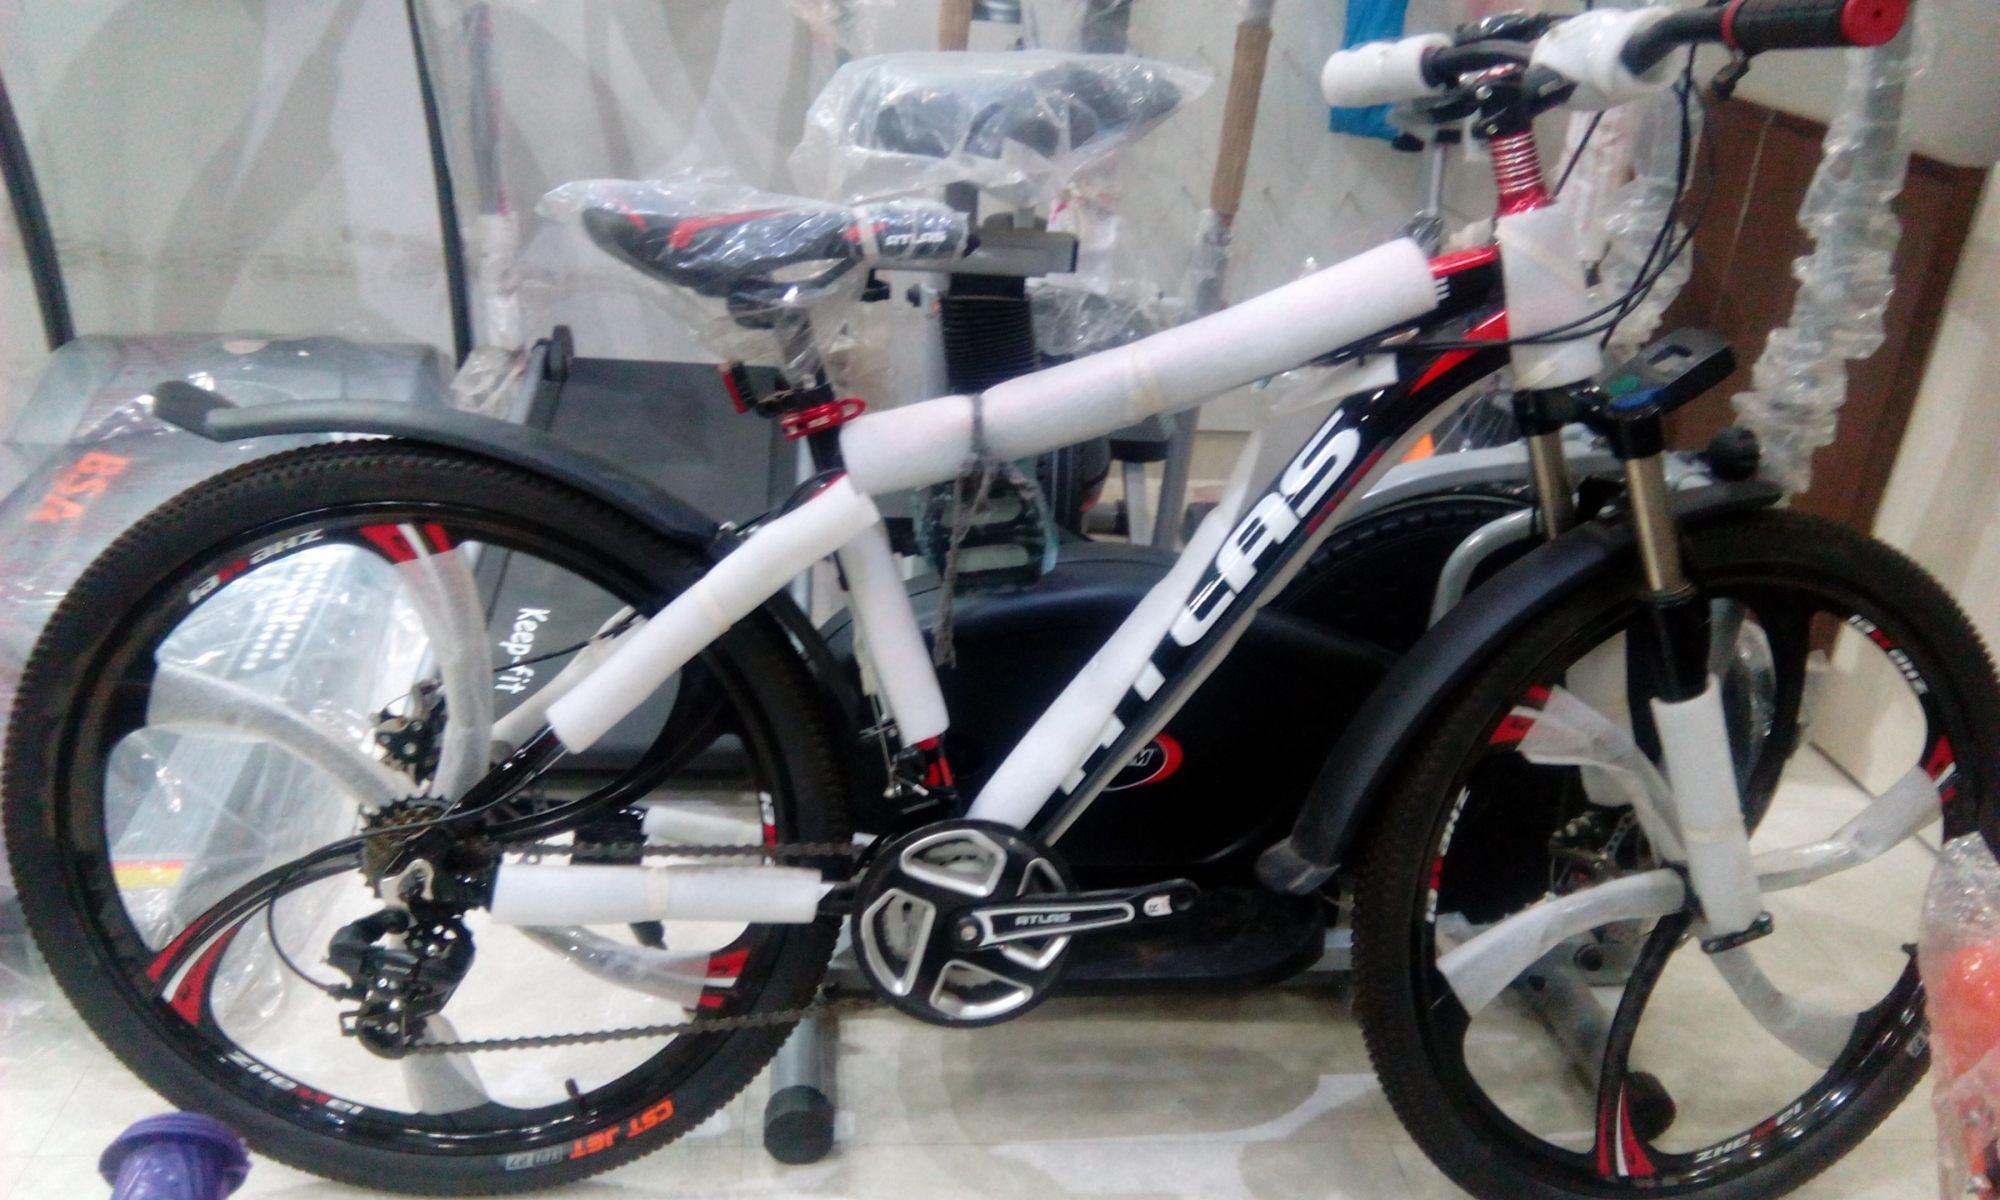 Bhagwan Dass Cycle Stores Ravi Jee, Motijheel - Bhagwaan Dass Cycle ...